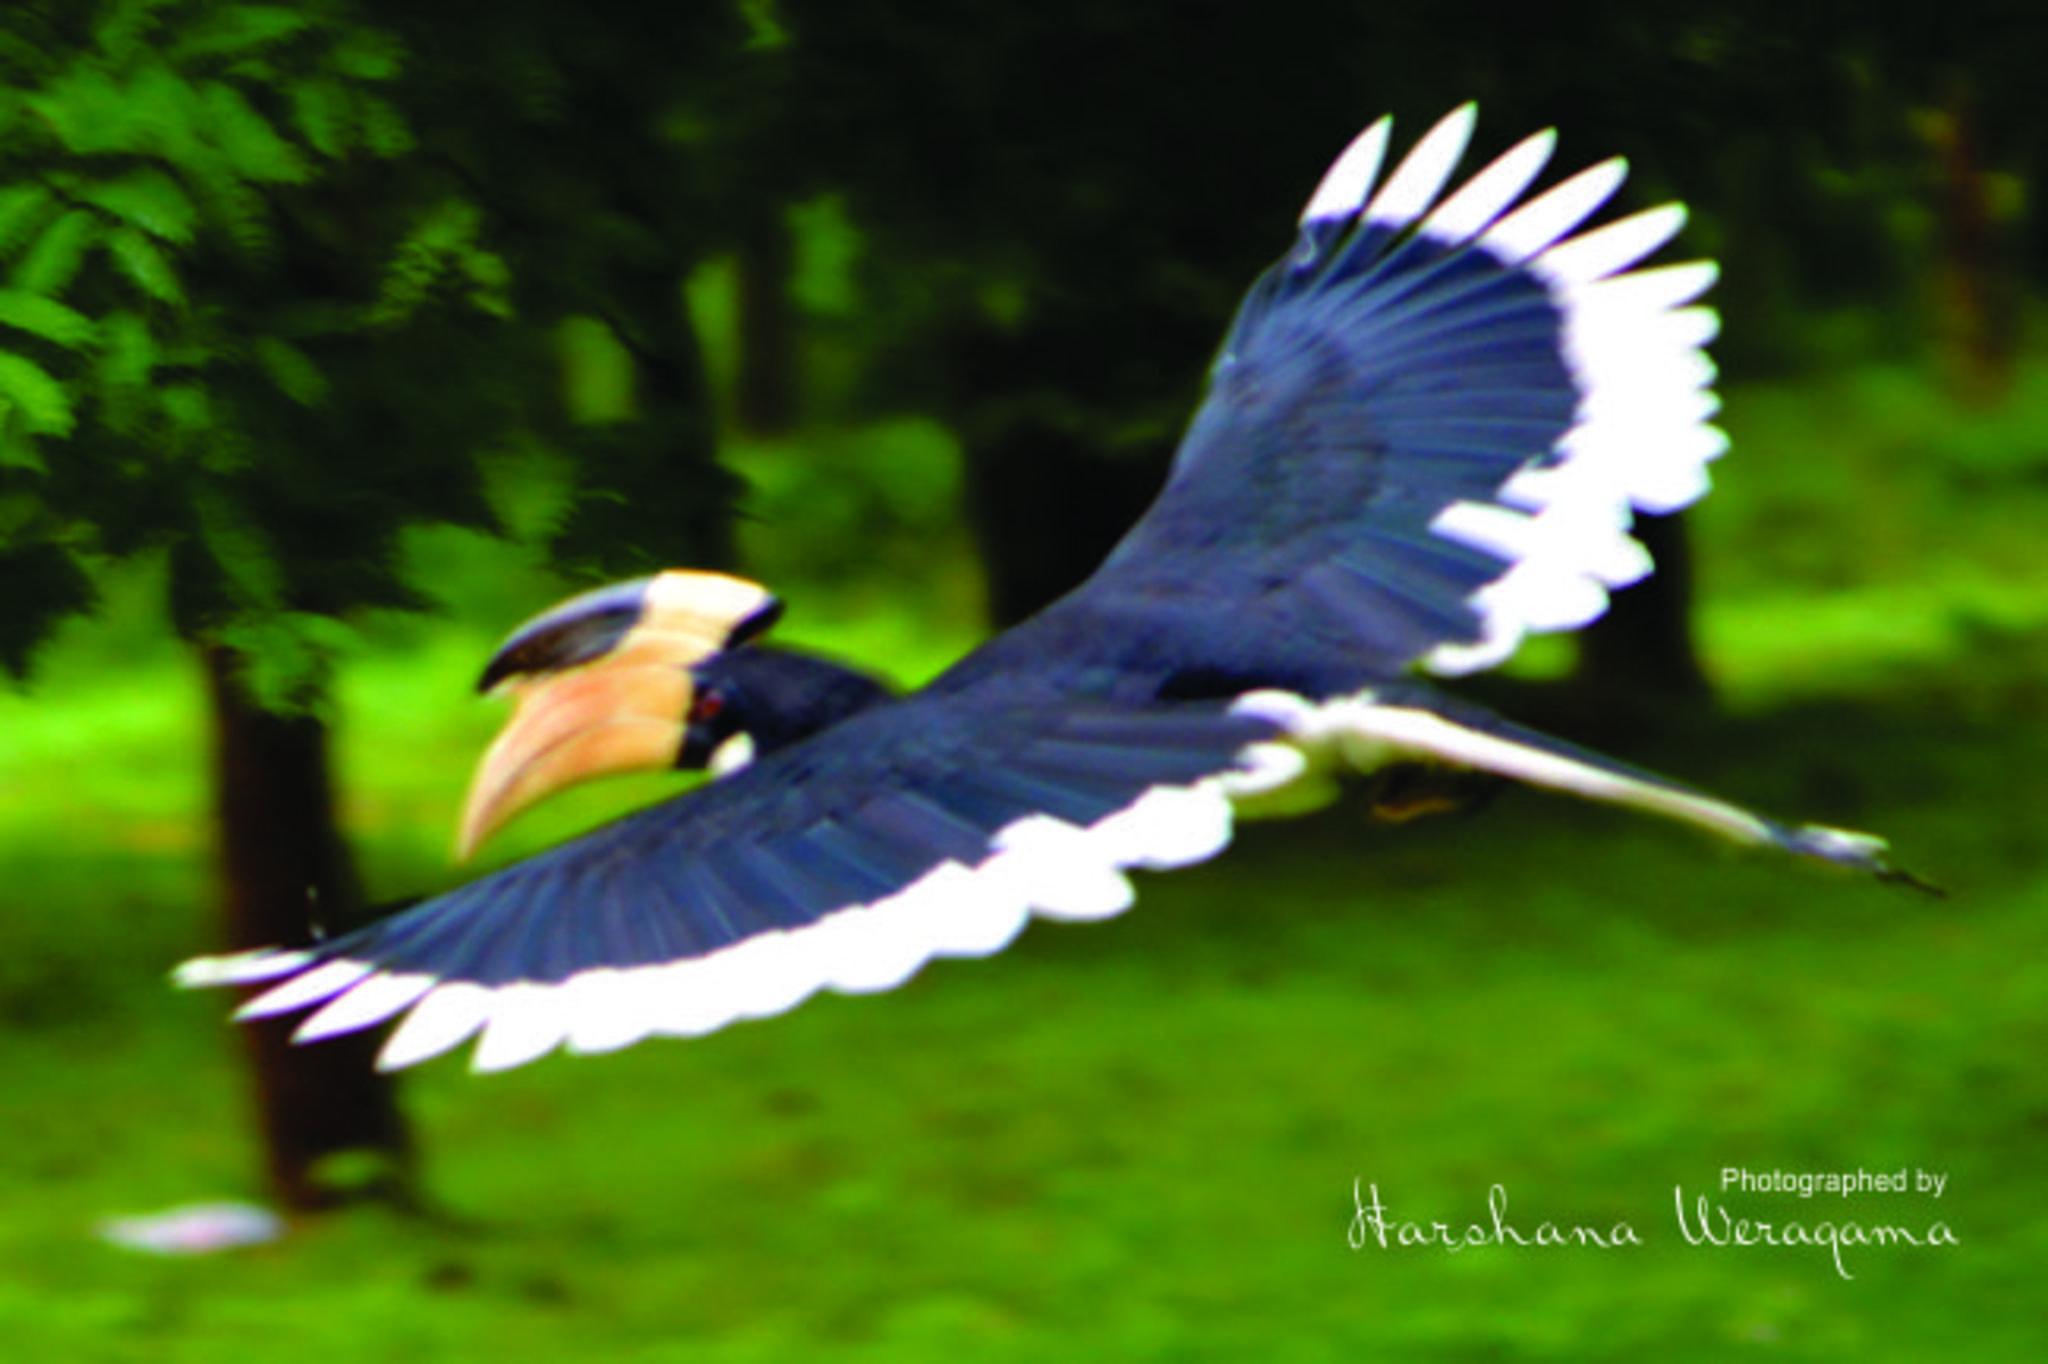 Take off by harshana.weragama